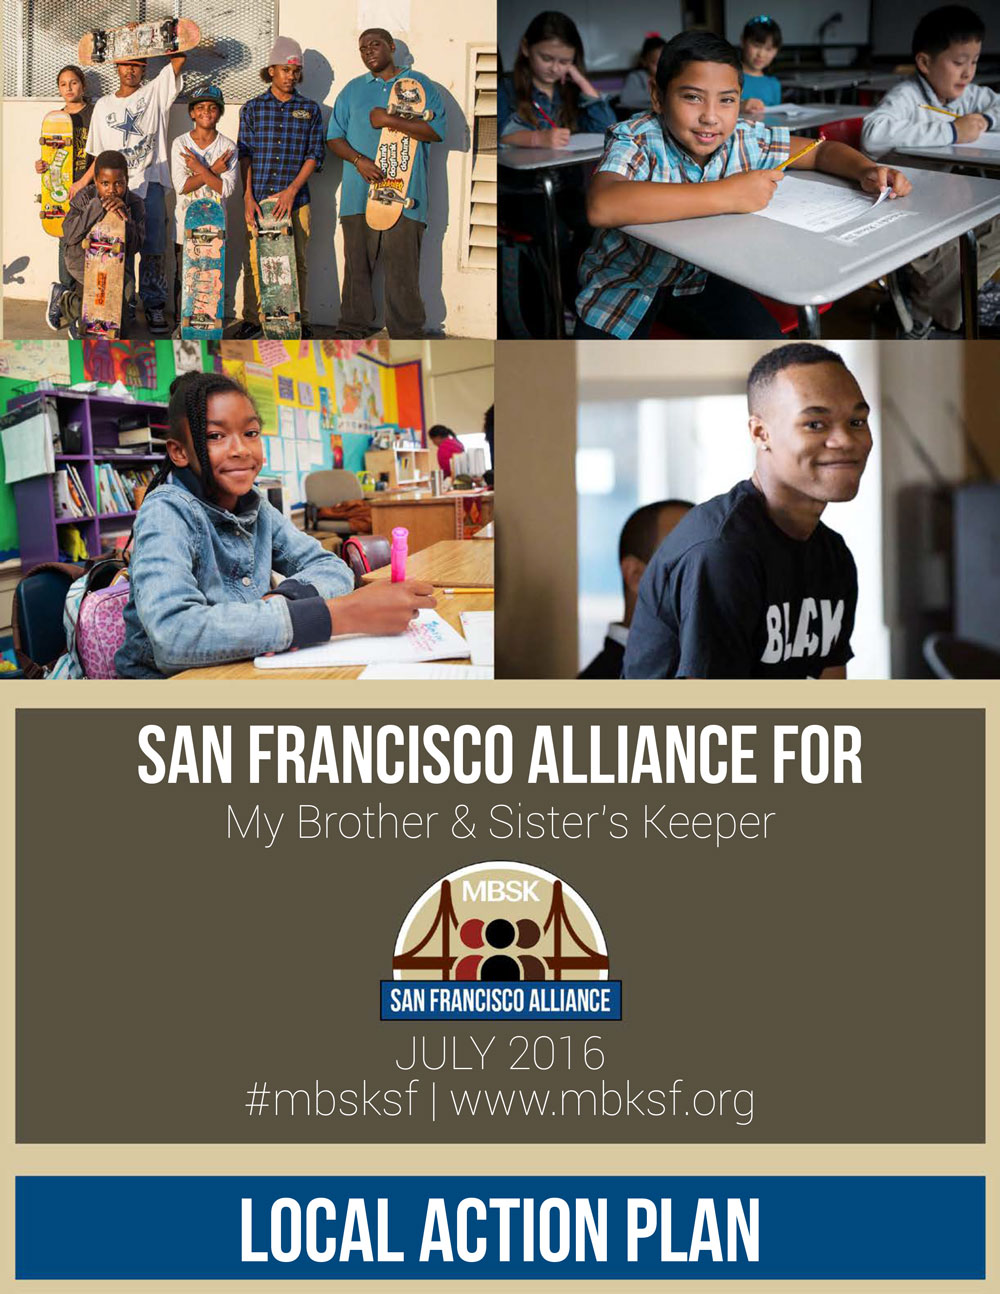 MBSK-Local-Action-Plan-July-2016.jpg